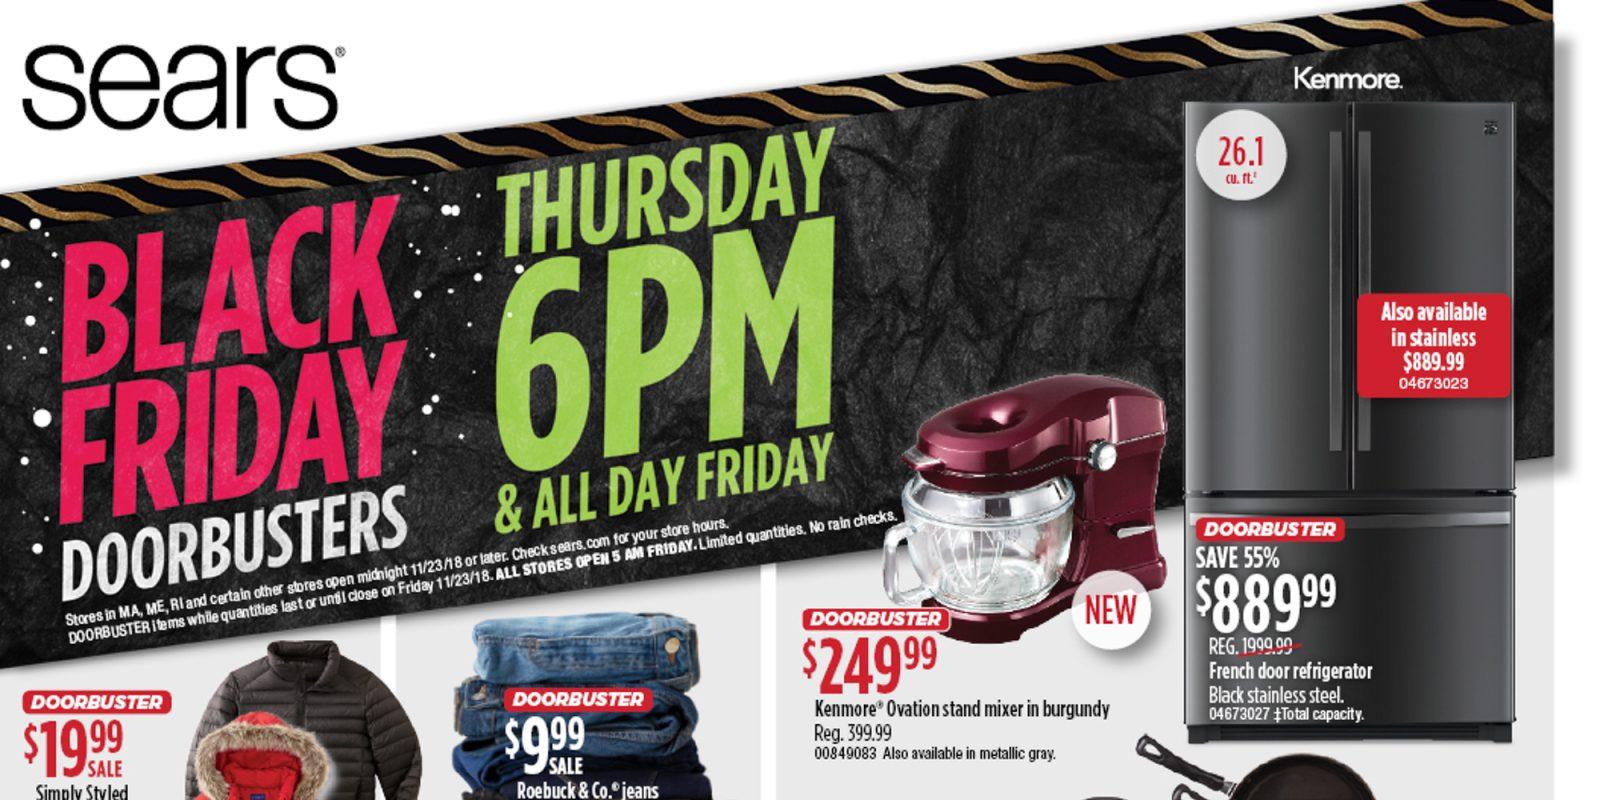 Sears May Be Bankrupt But Its Black Friday 2018 Ad Has Discounted